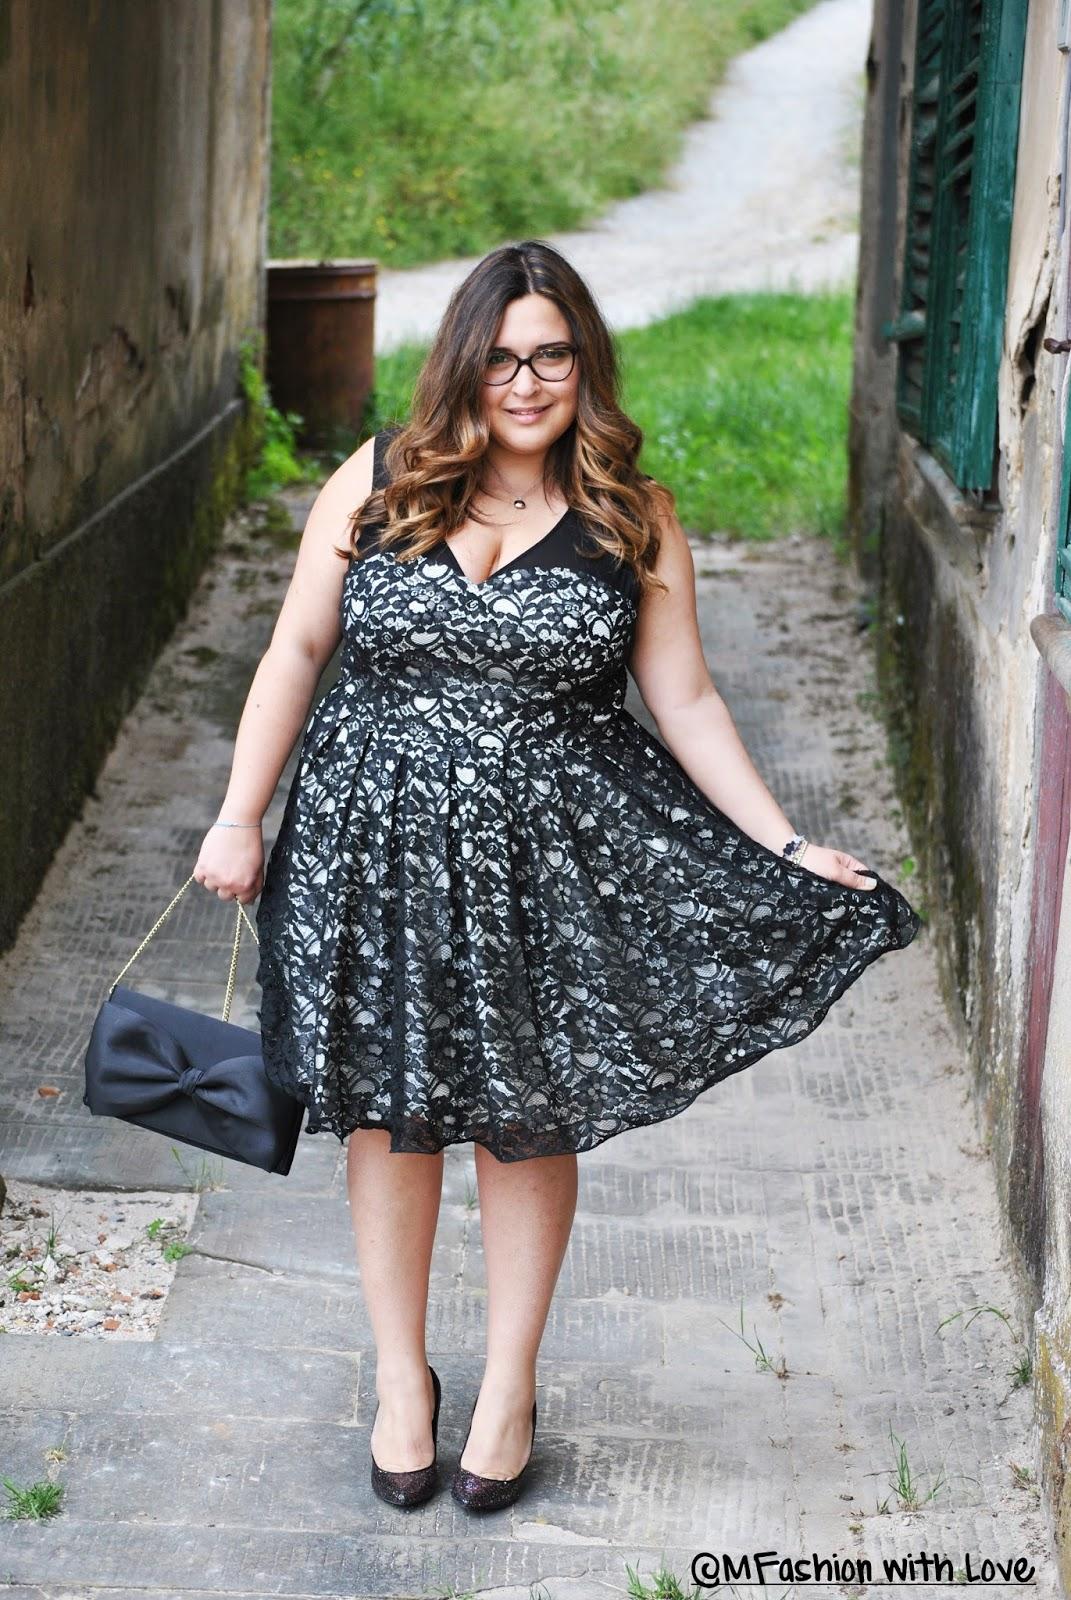 Curvy Blog By Moira Pugliese Outfit Per Battesimo E Top 5 Abiti Da